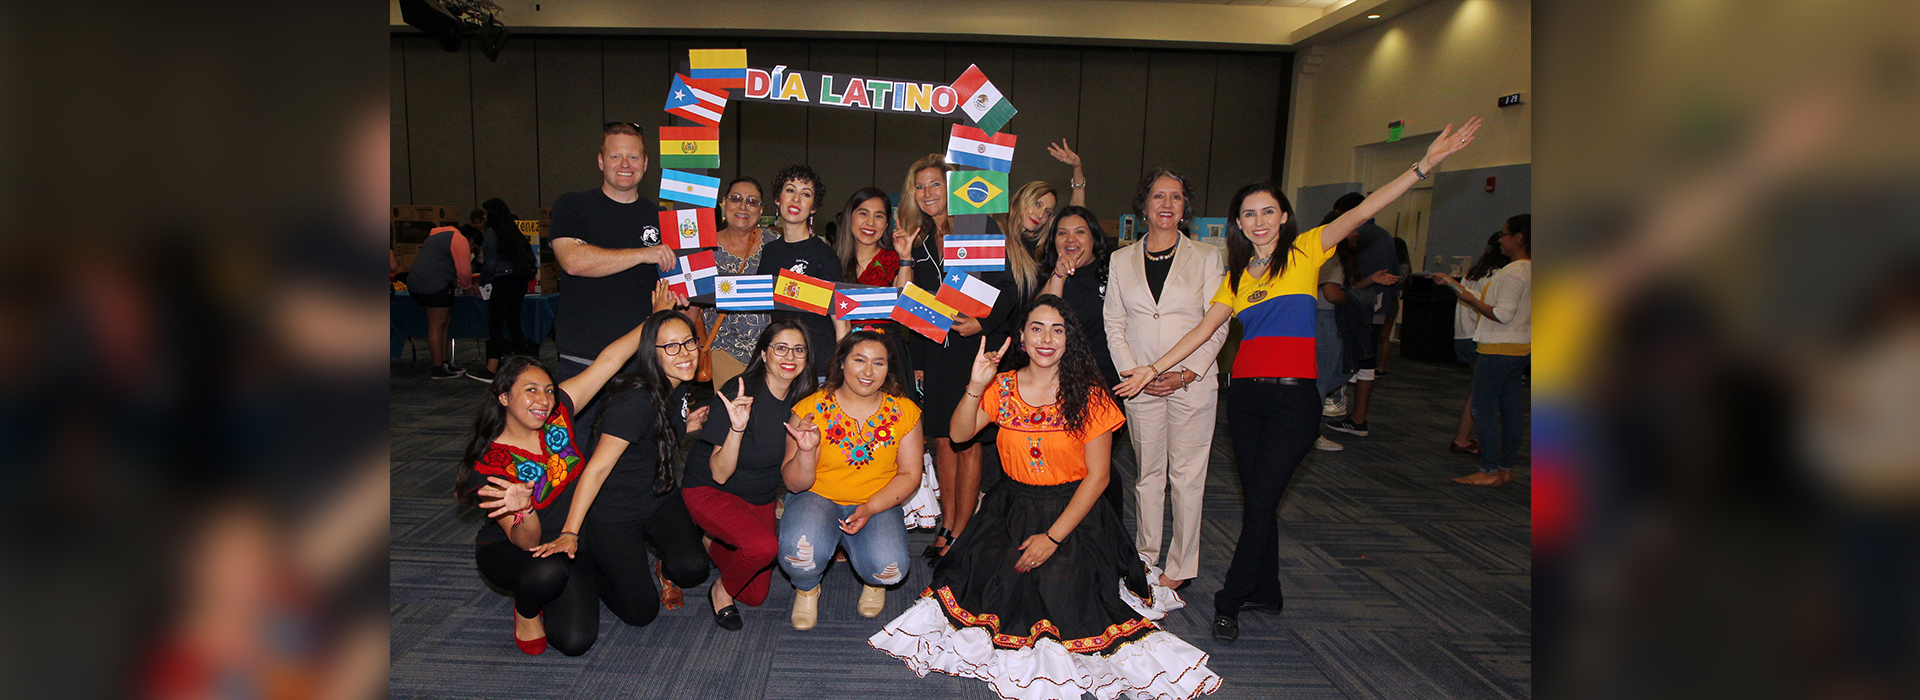 CSUSB Dia Latino Celebrates Latin American Culture